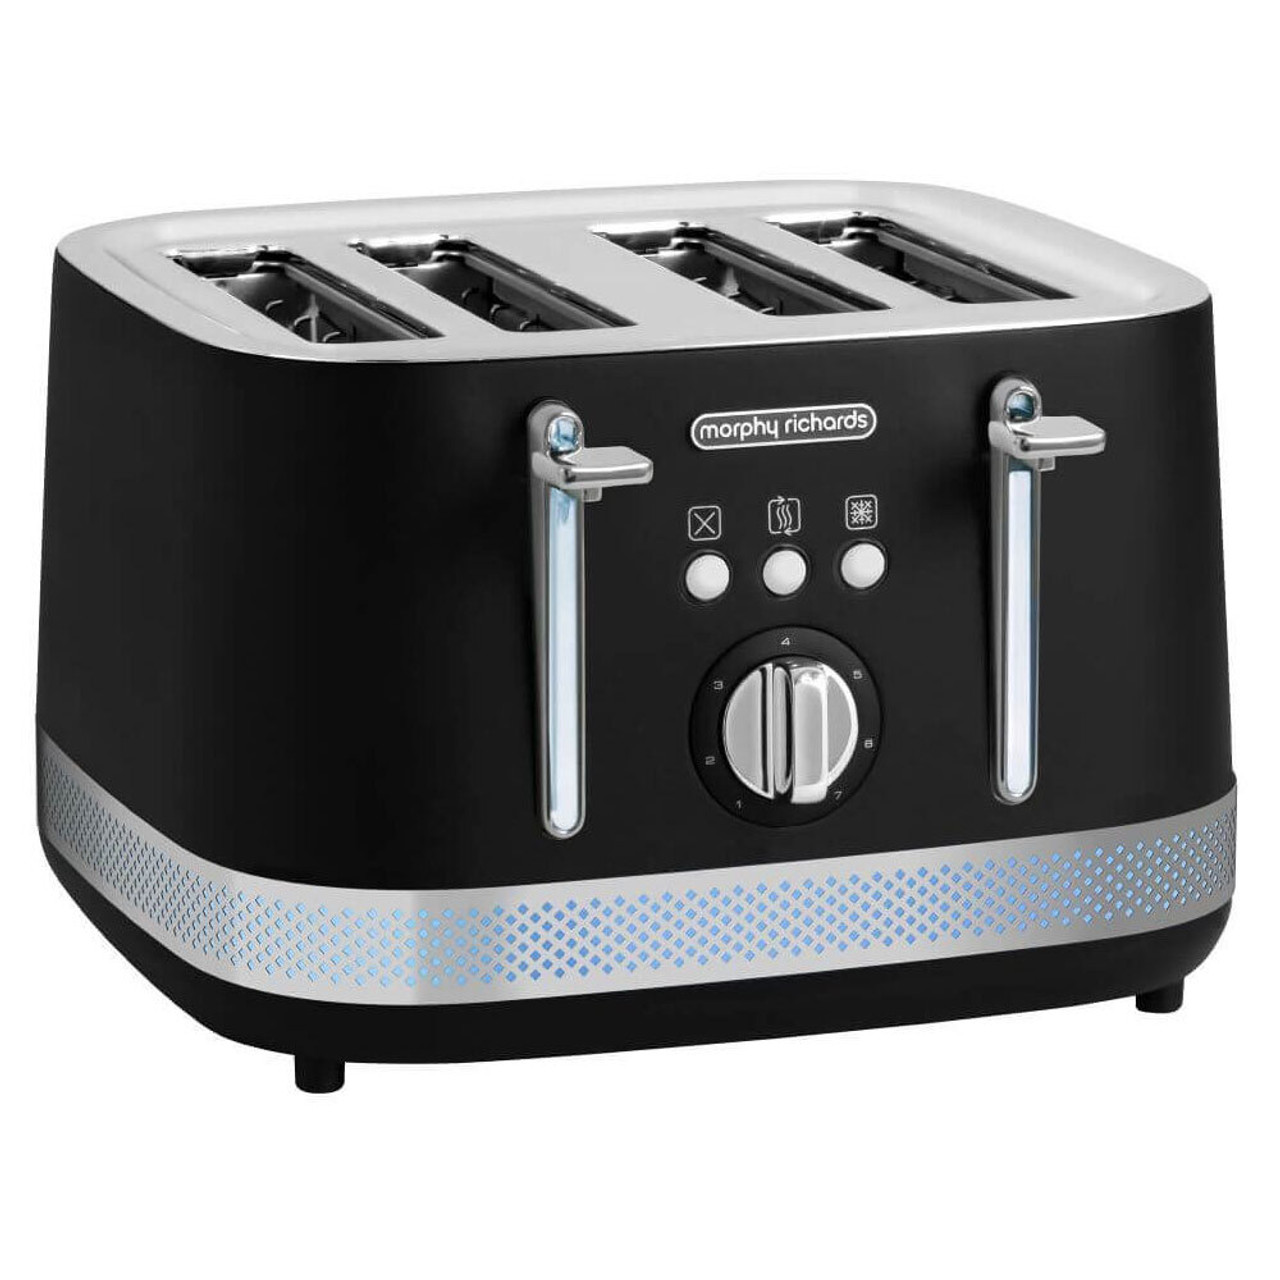 Morphy Richards 108020 248020 Illumination Kettle & 4 Slice Toaster PACK - Black